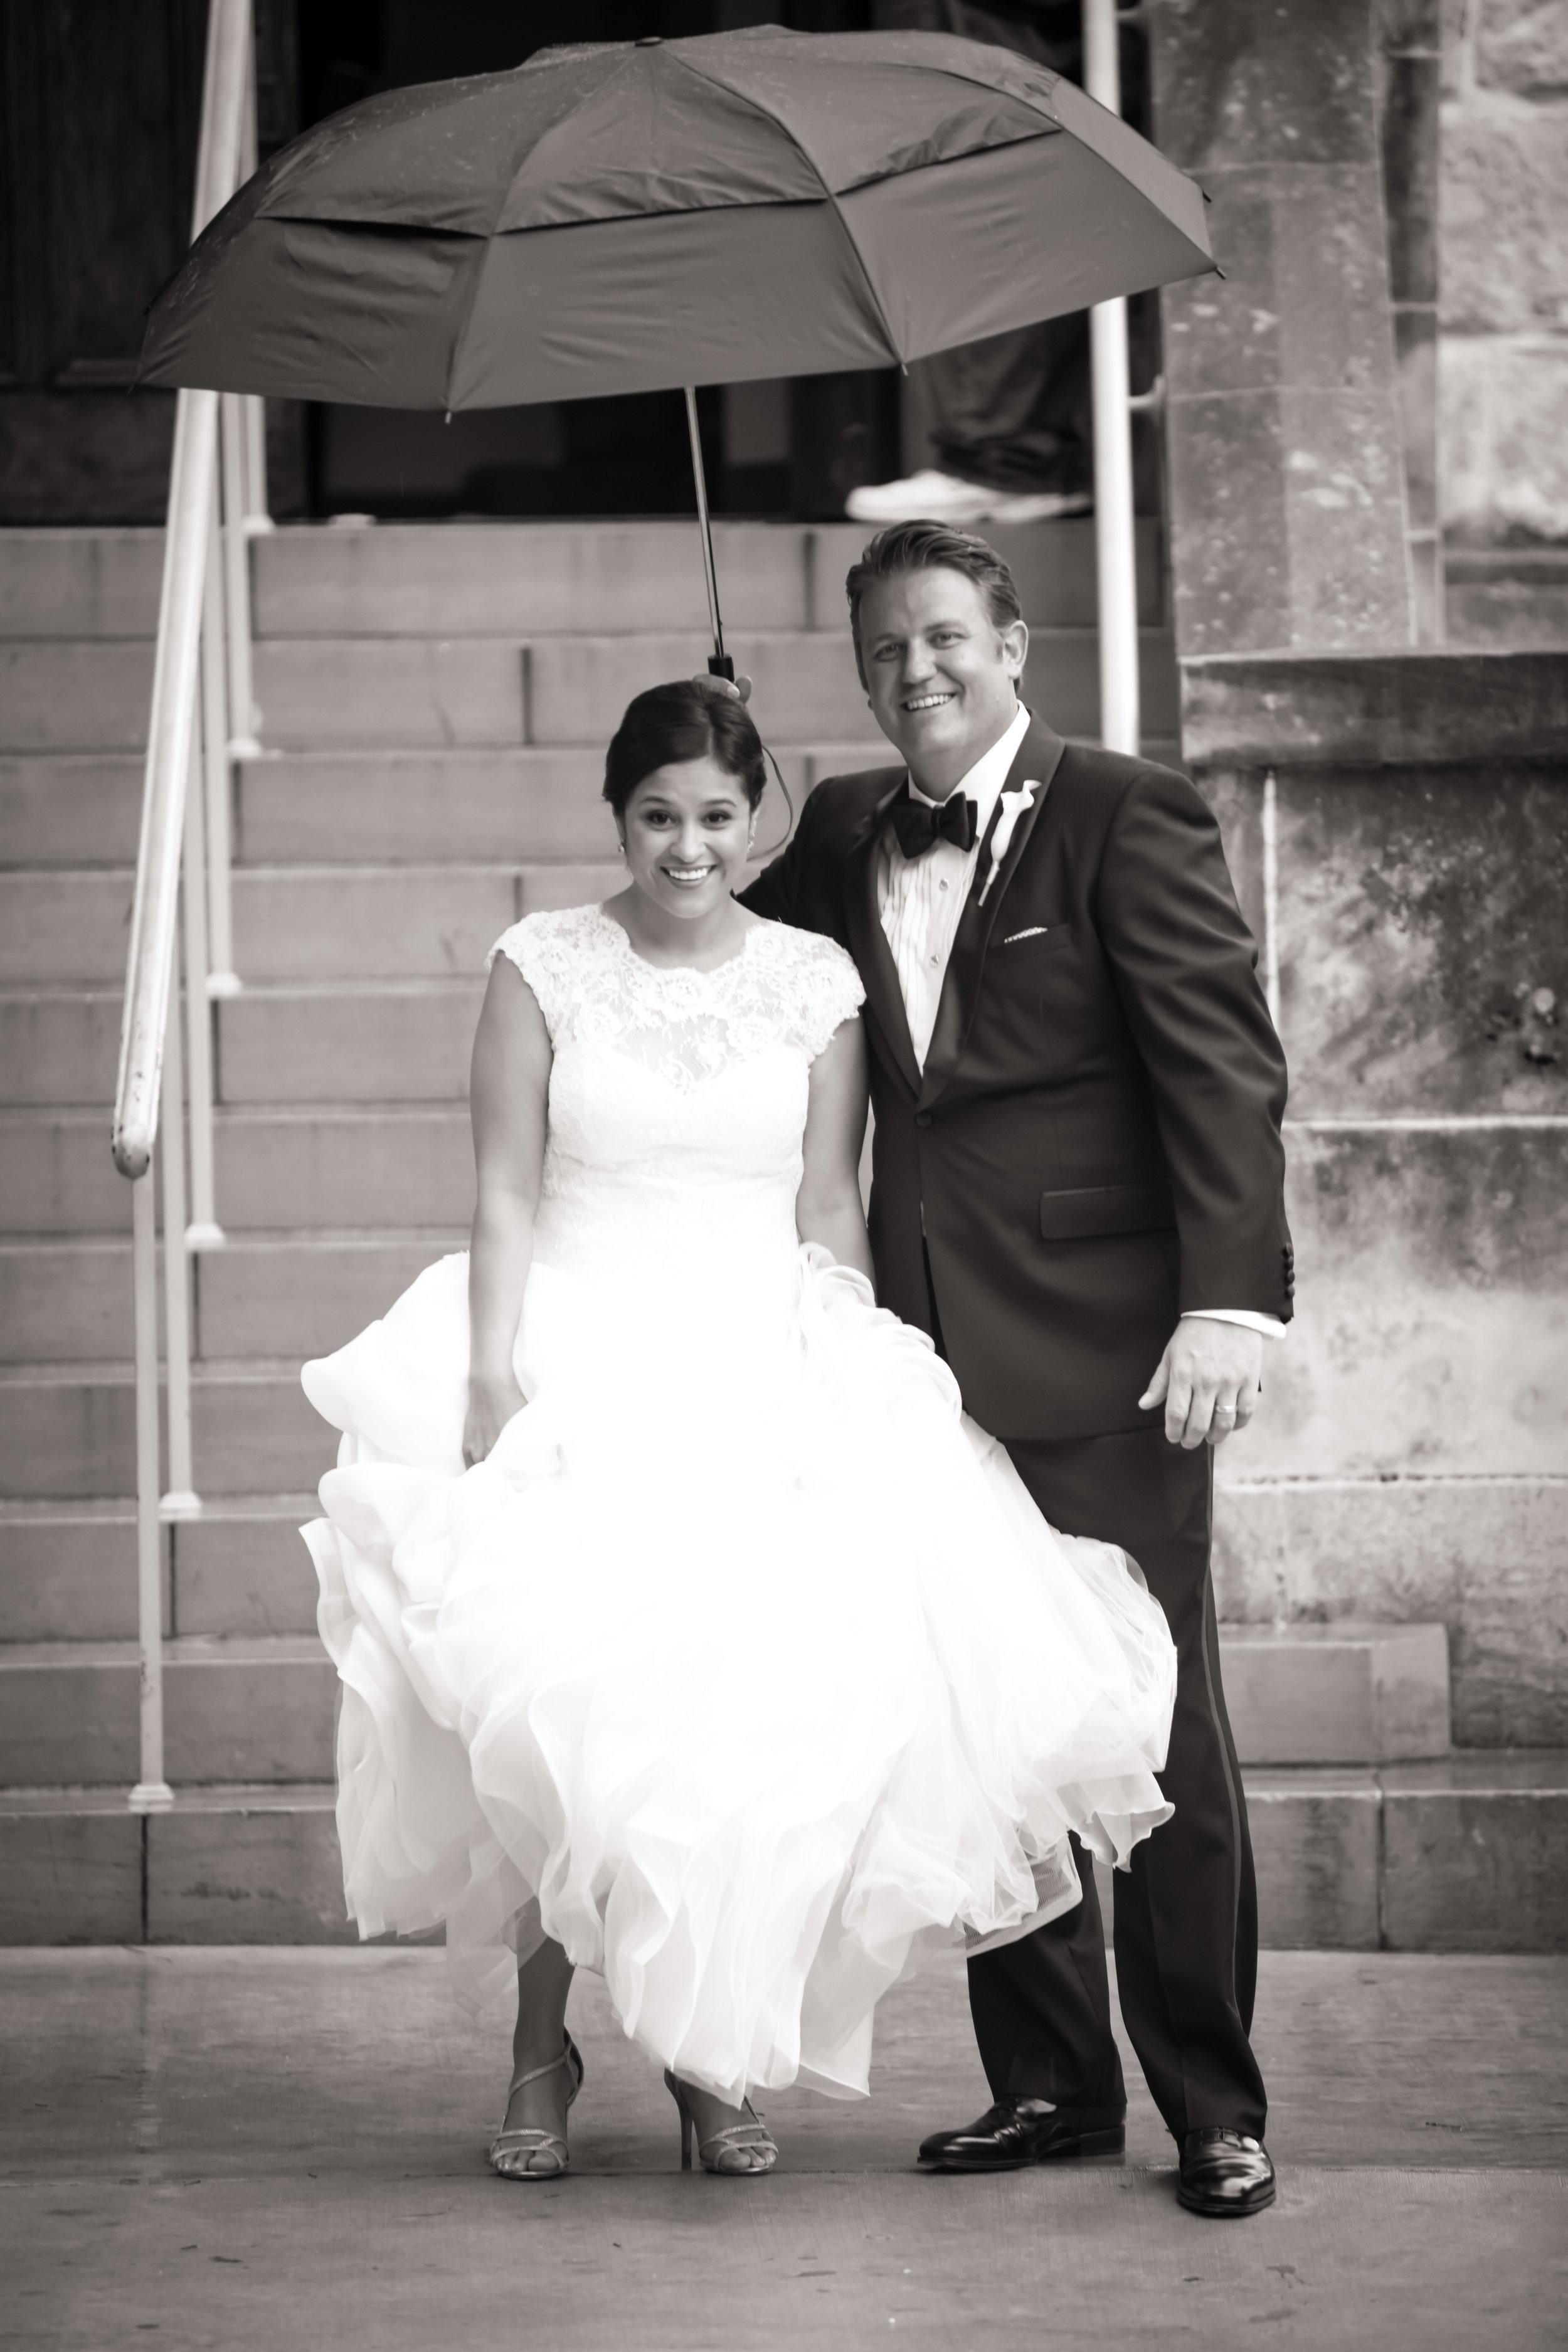 Marble_Falls_Horseshoe_Bay_Photographer_Torres_Wedding_38.jpg